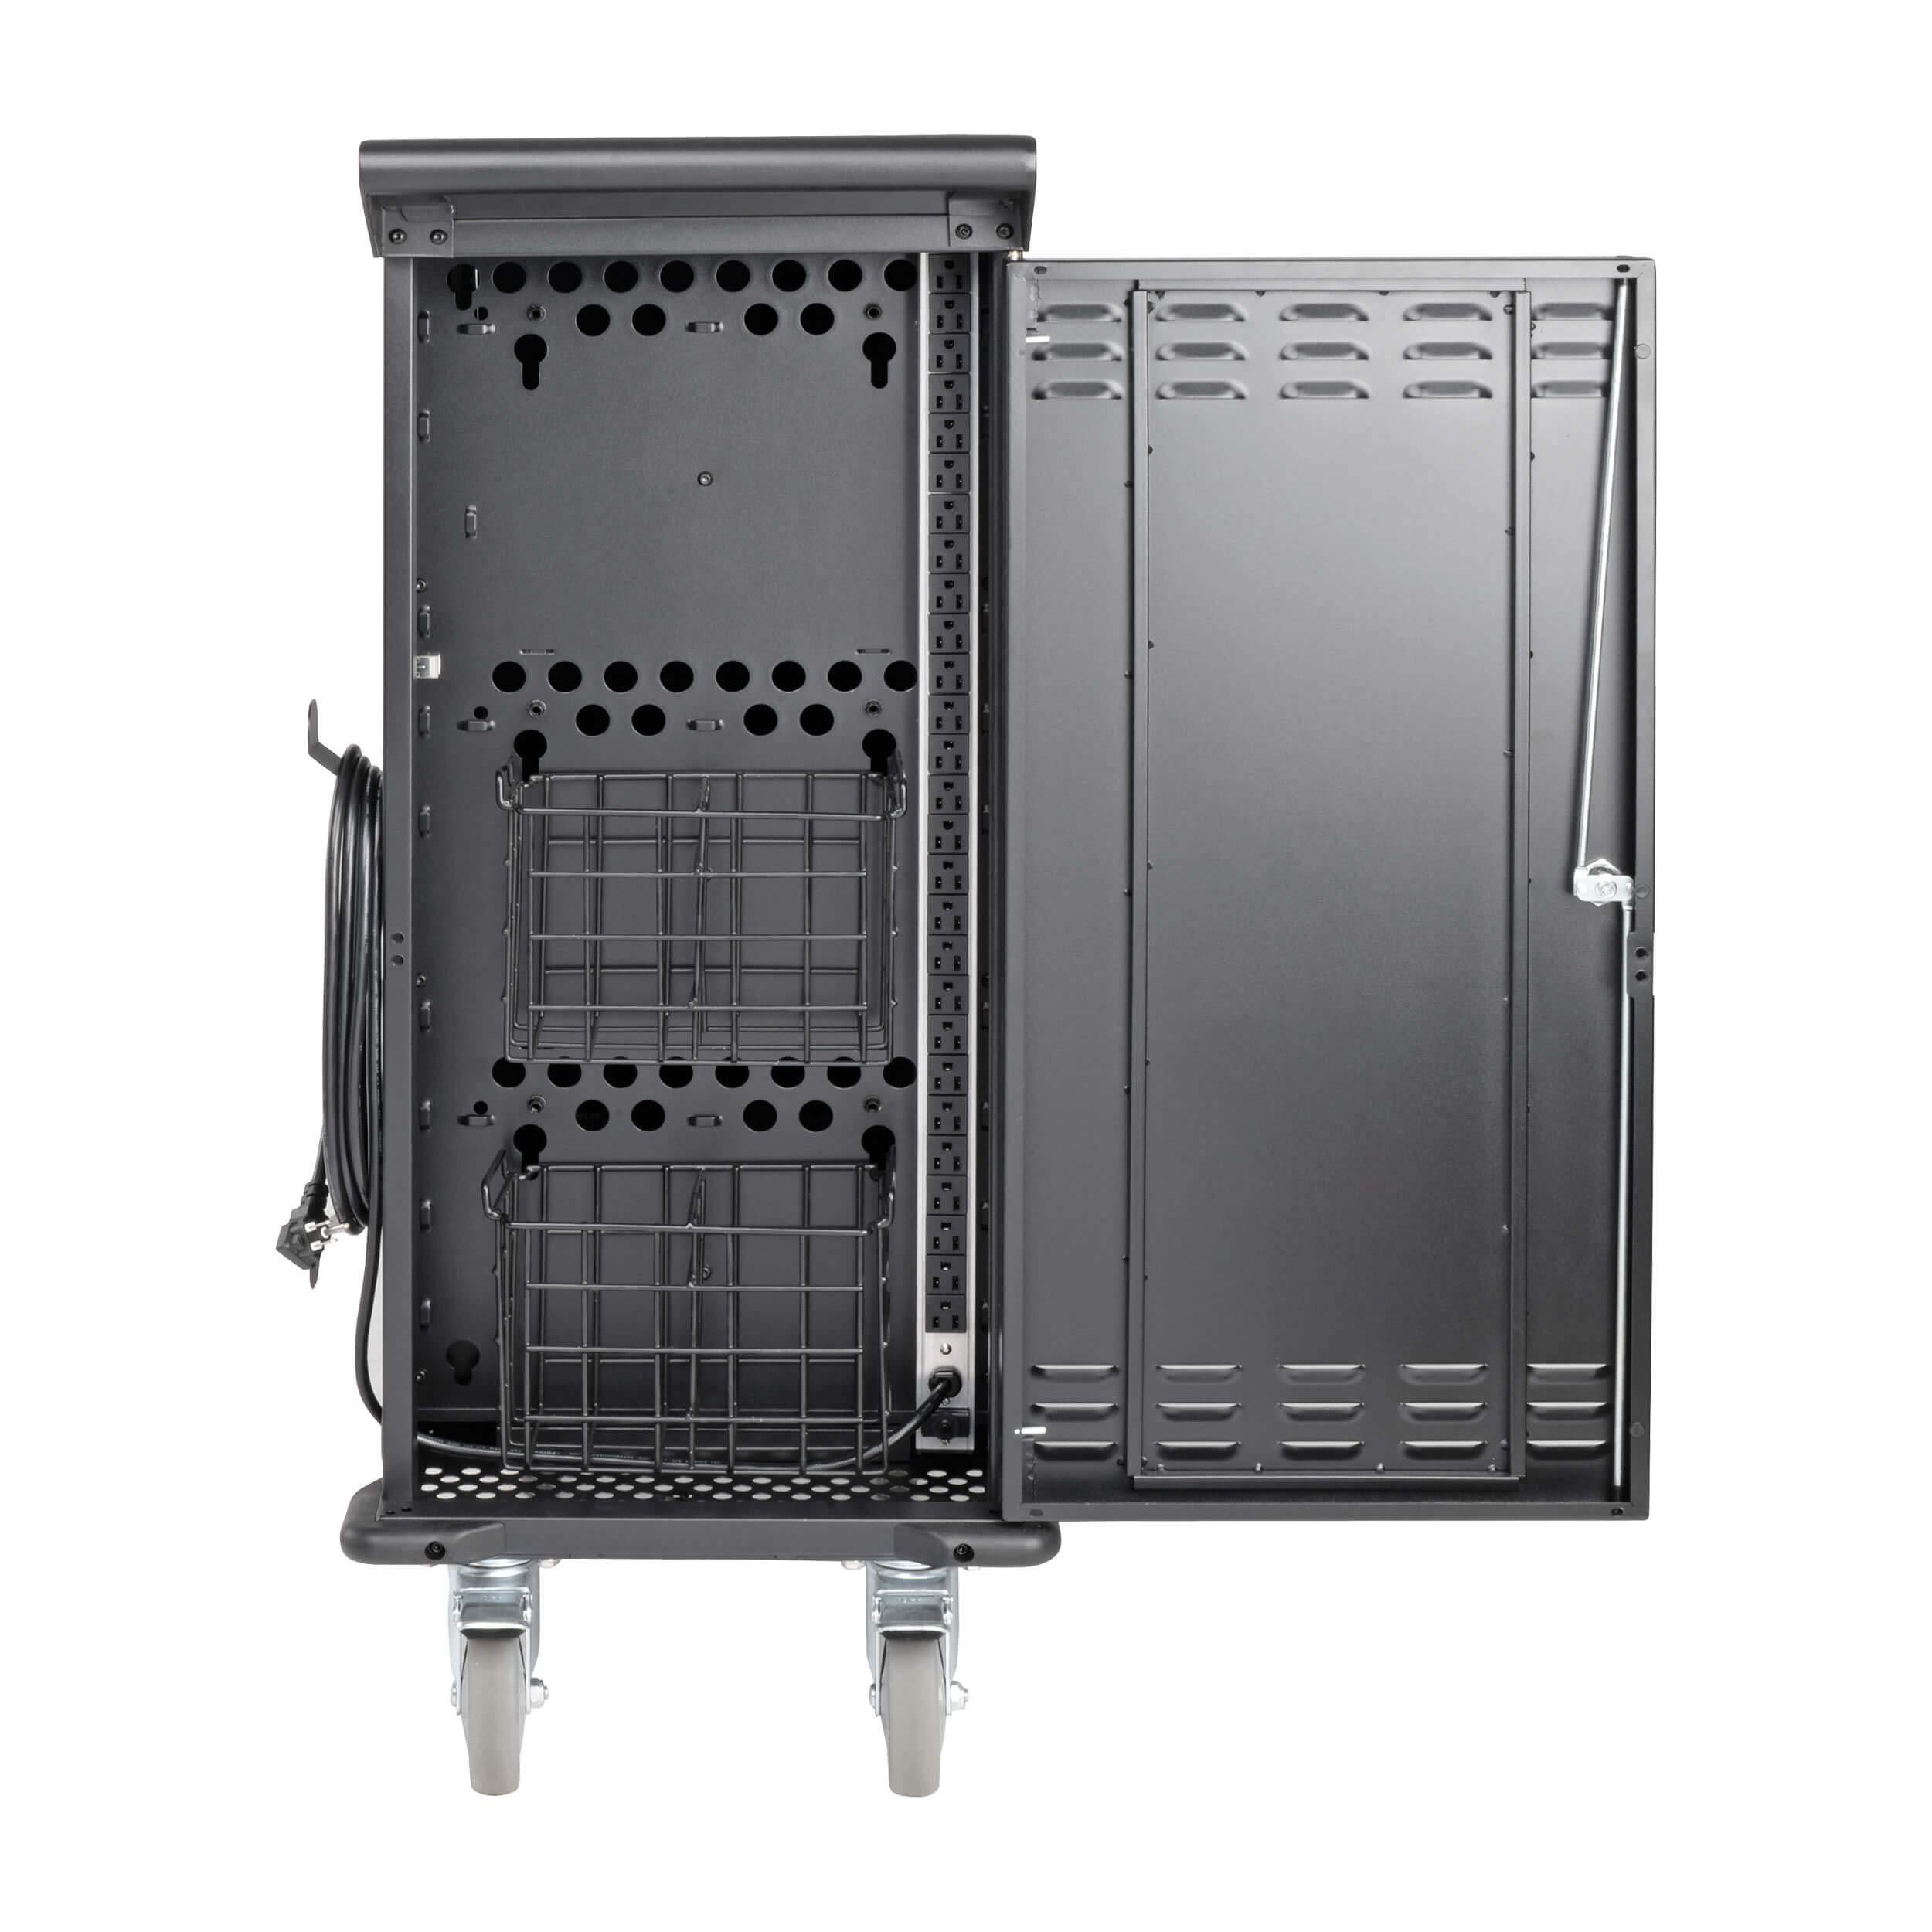 Tripp Lite 27-Port AC Mobile Charging Cart Storage Station for Chromebooks, iPads, Laptops, Tablets, Black (CSC27AC) by Tripp Lite (Image #6)